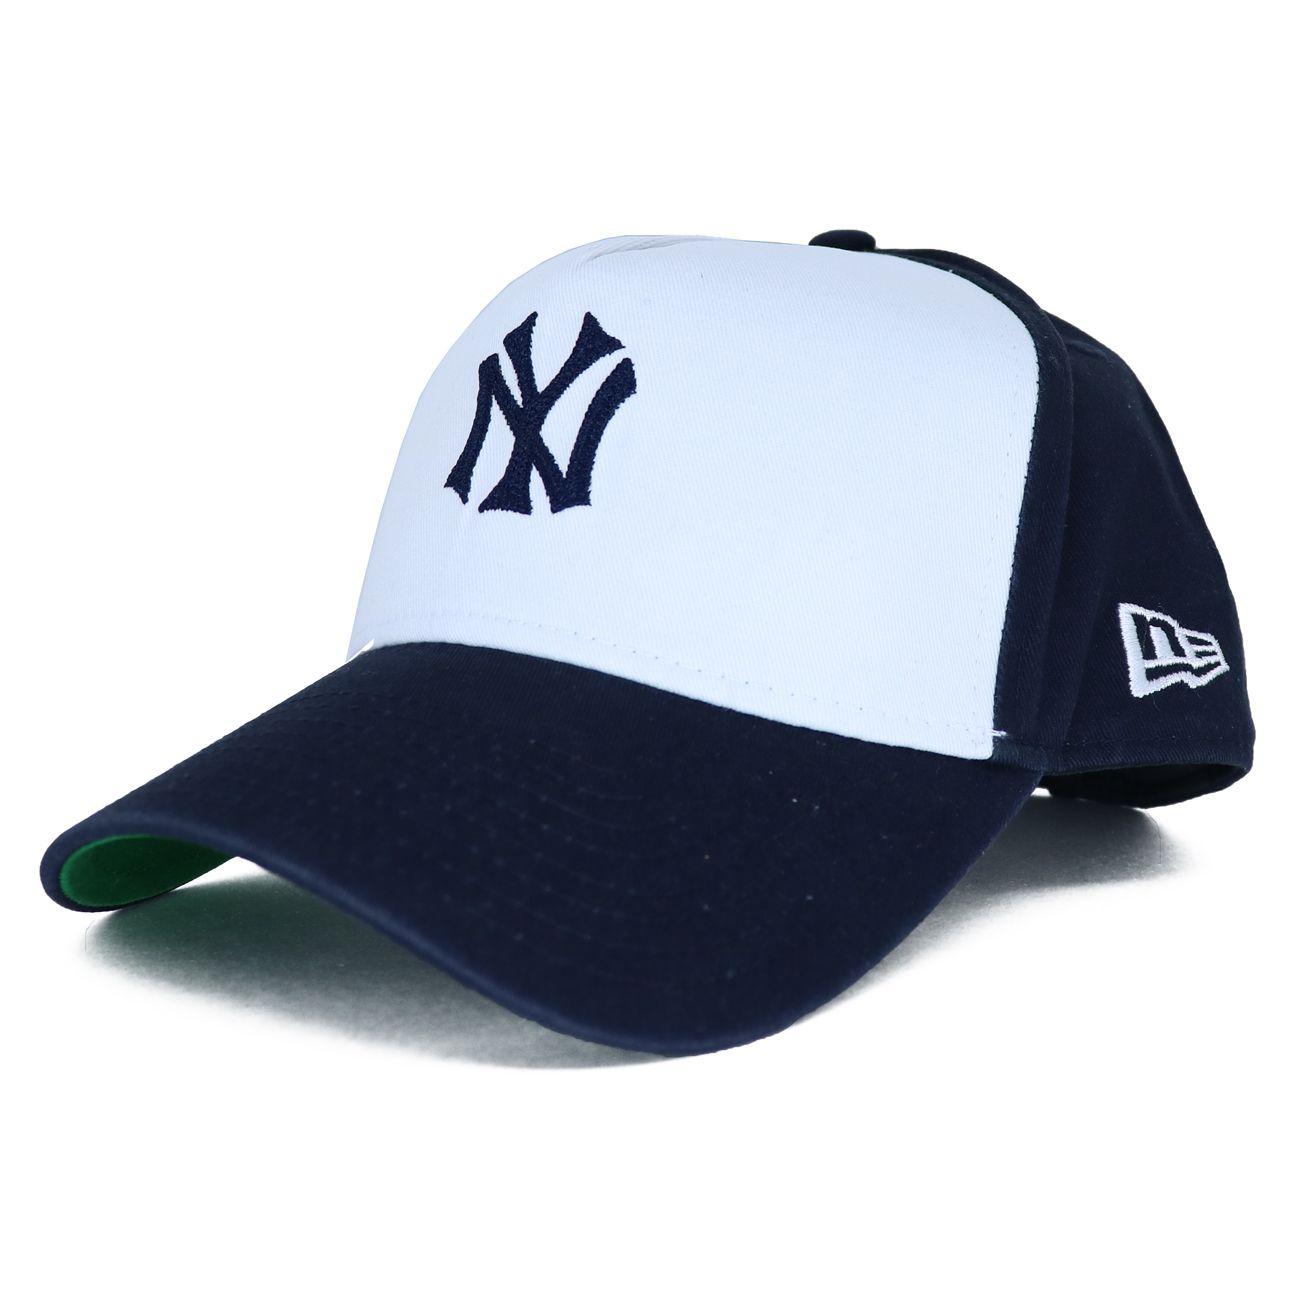 Boné New Era Mlb Yankees Reborn Heritage Class 940